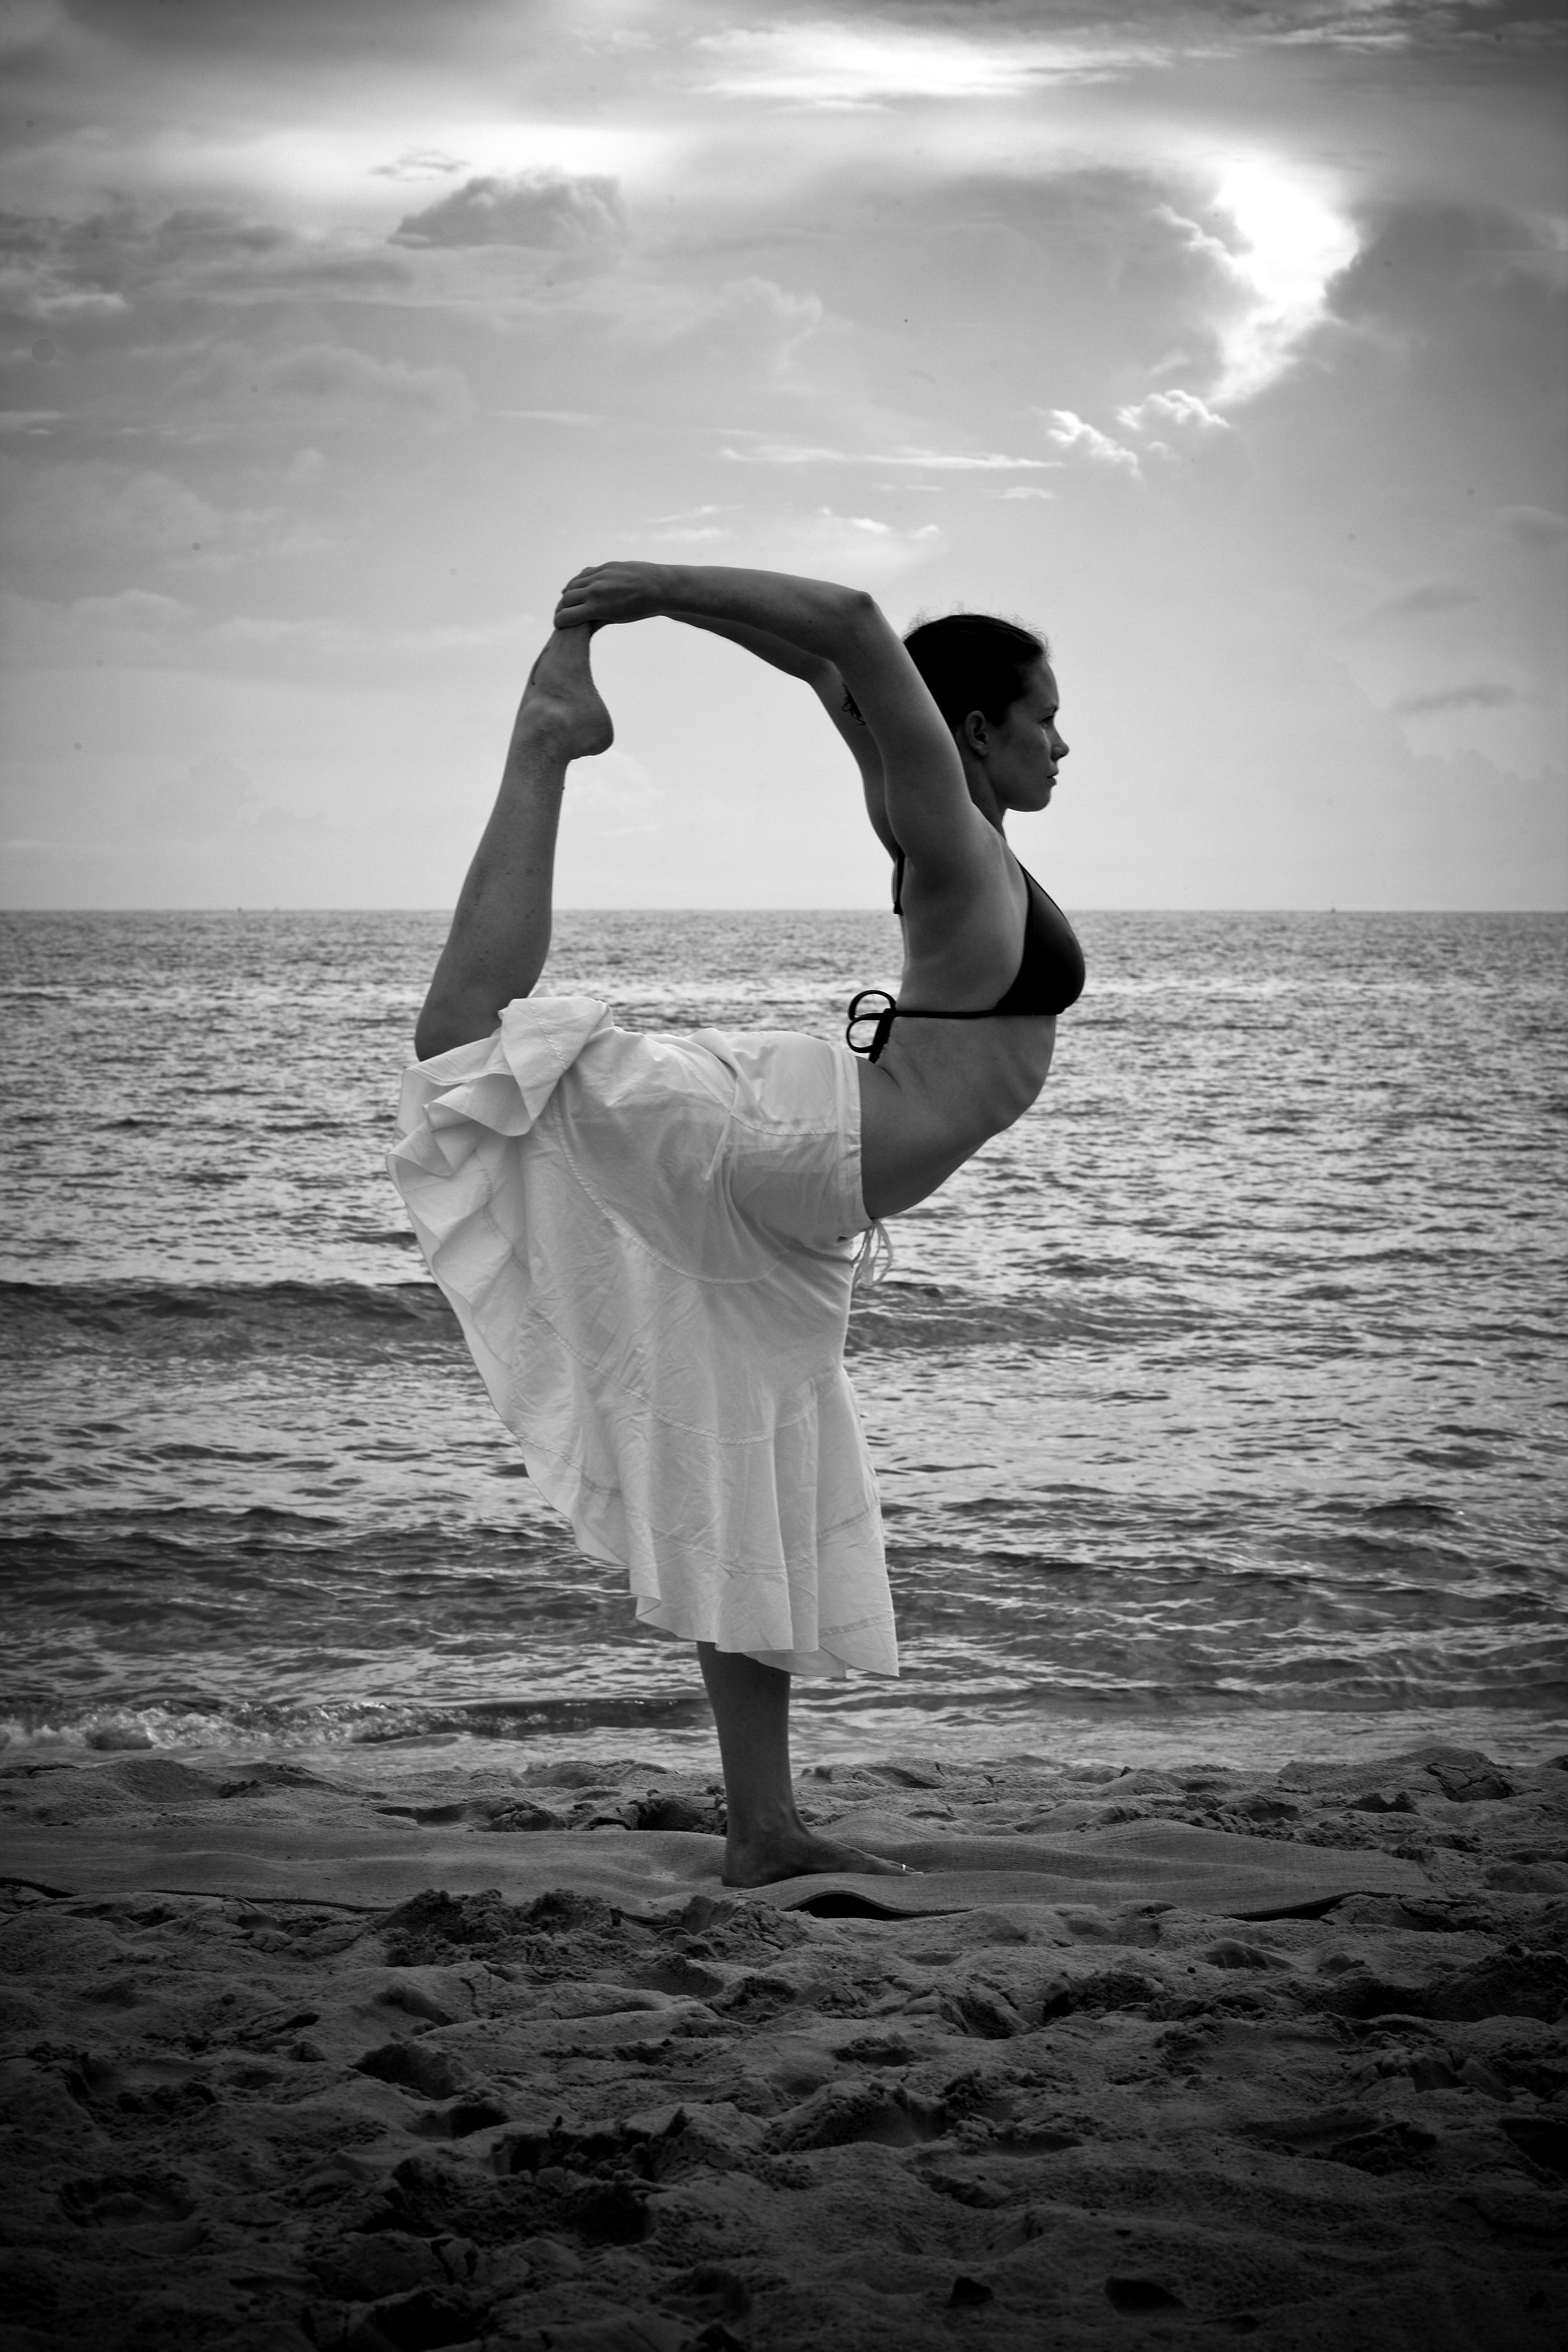 Dancer's Pose